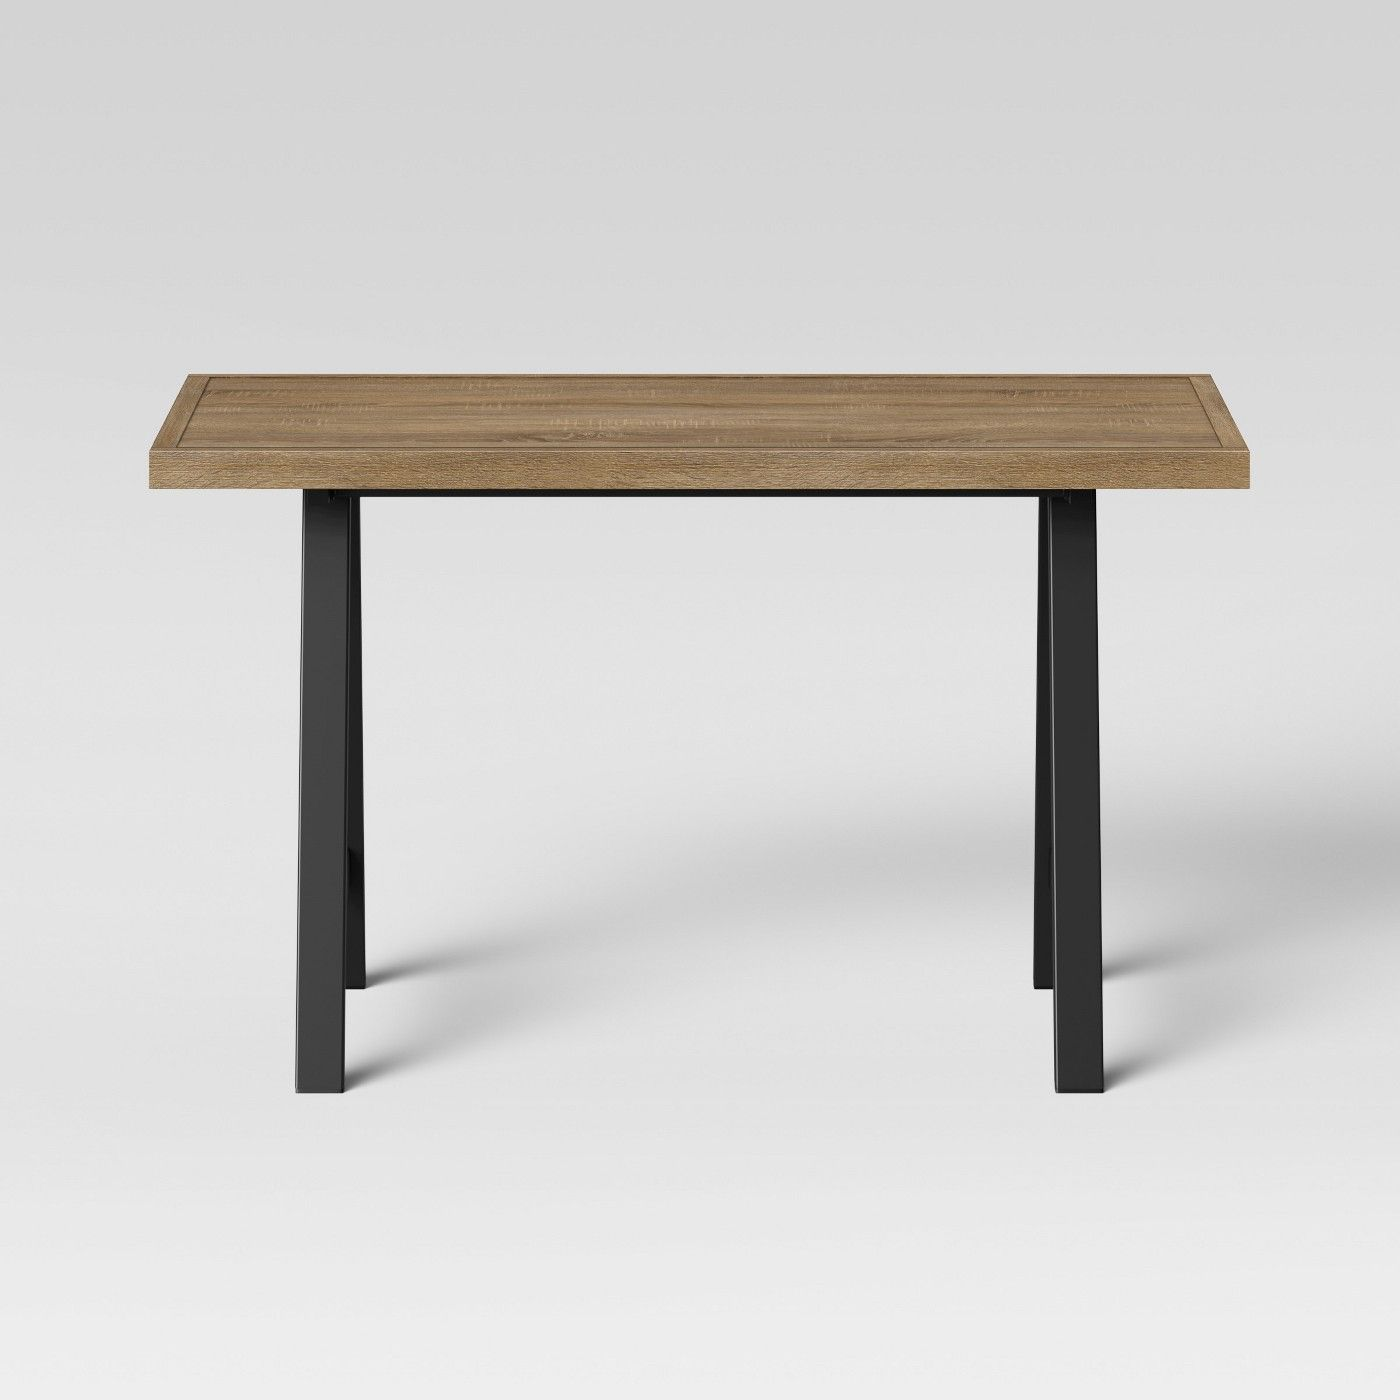 Taft Work Table  Threshold  Image 1 Of 3